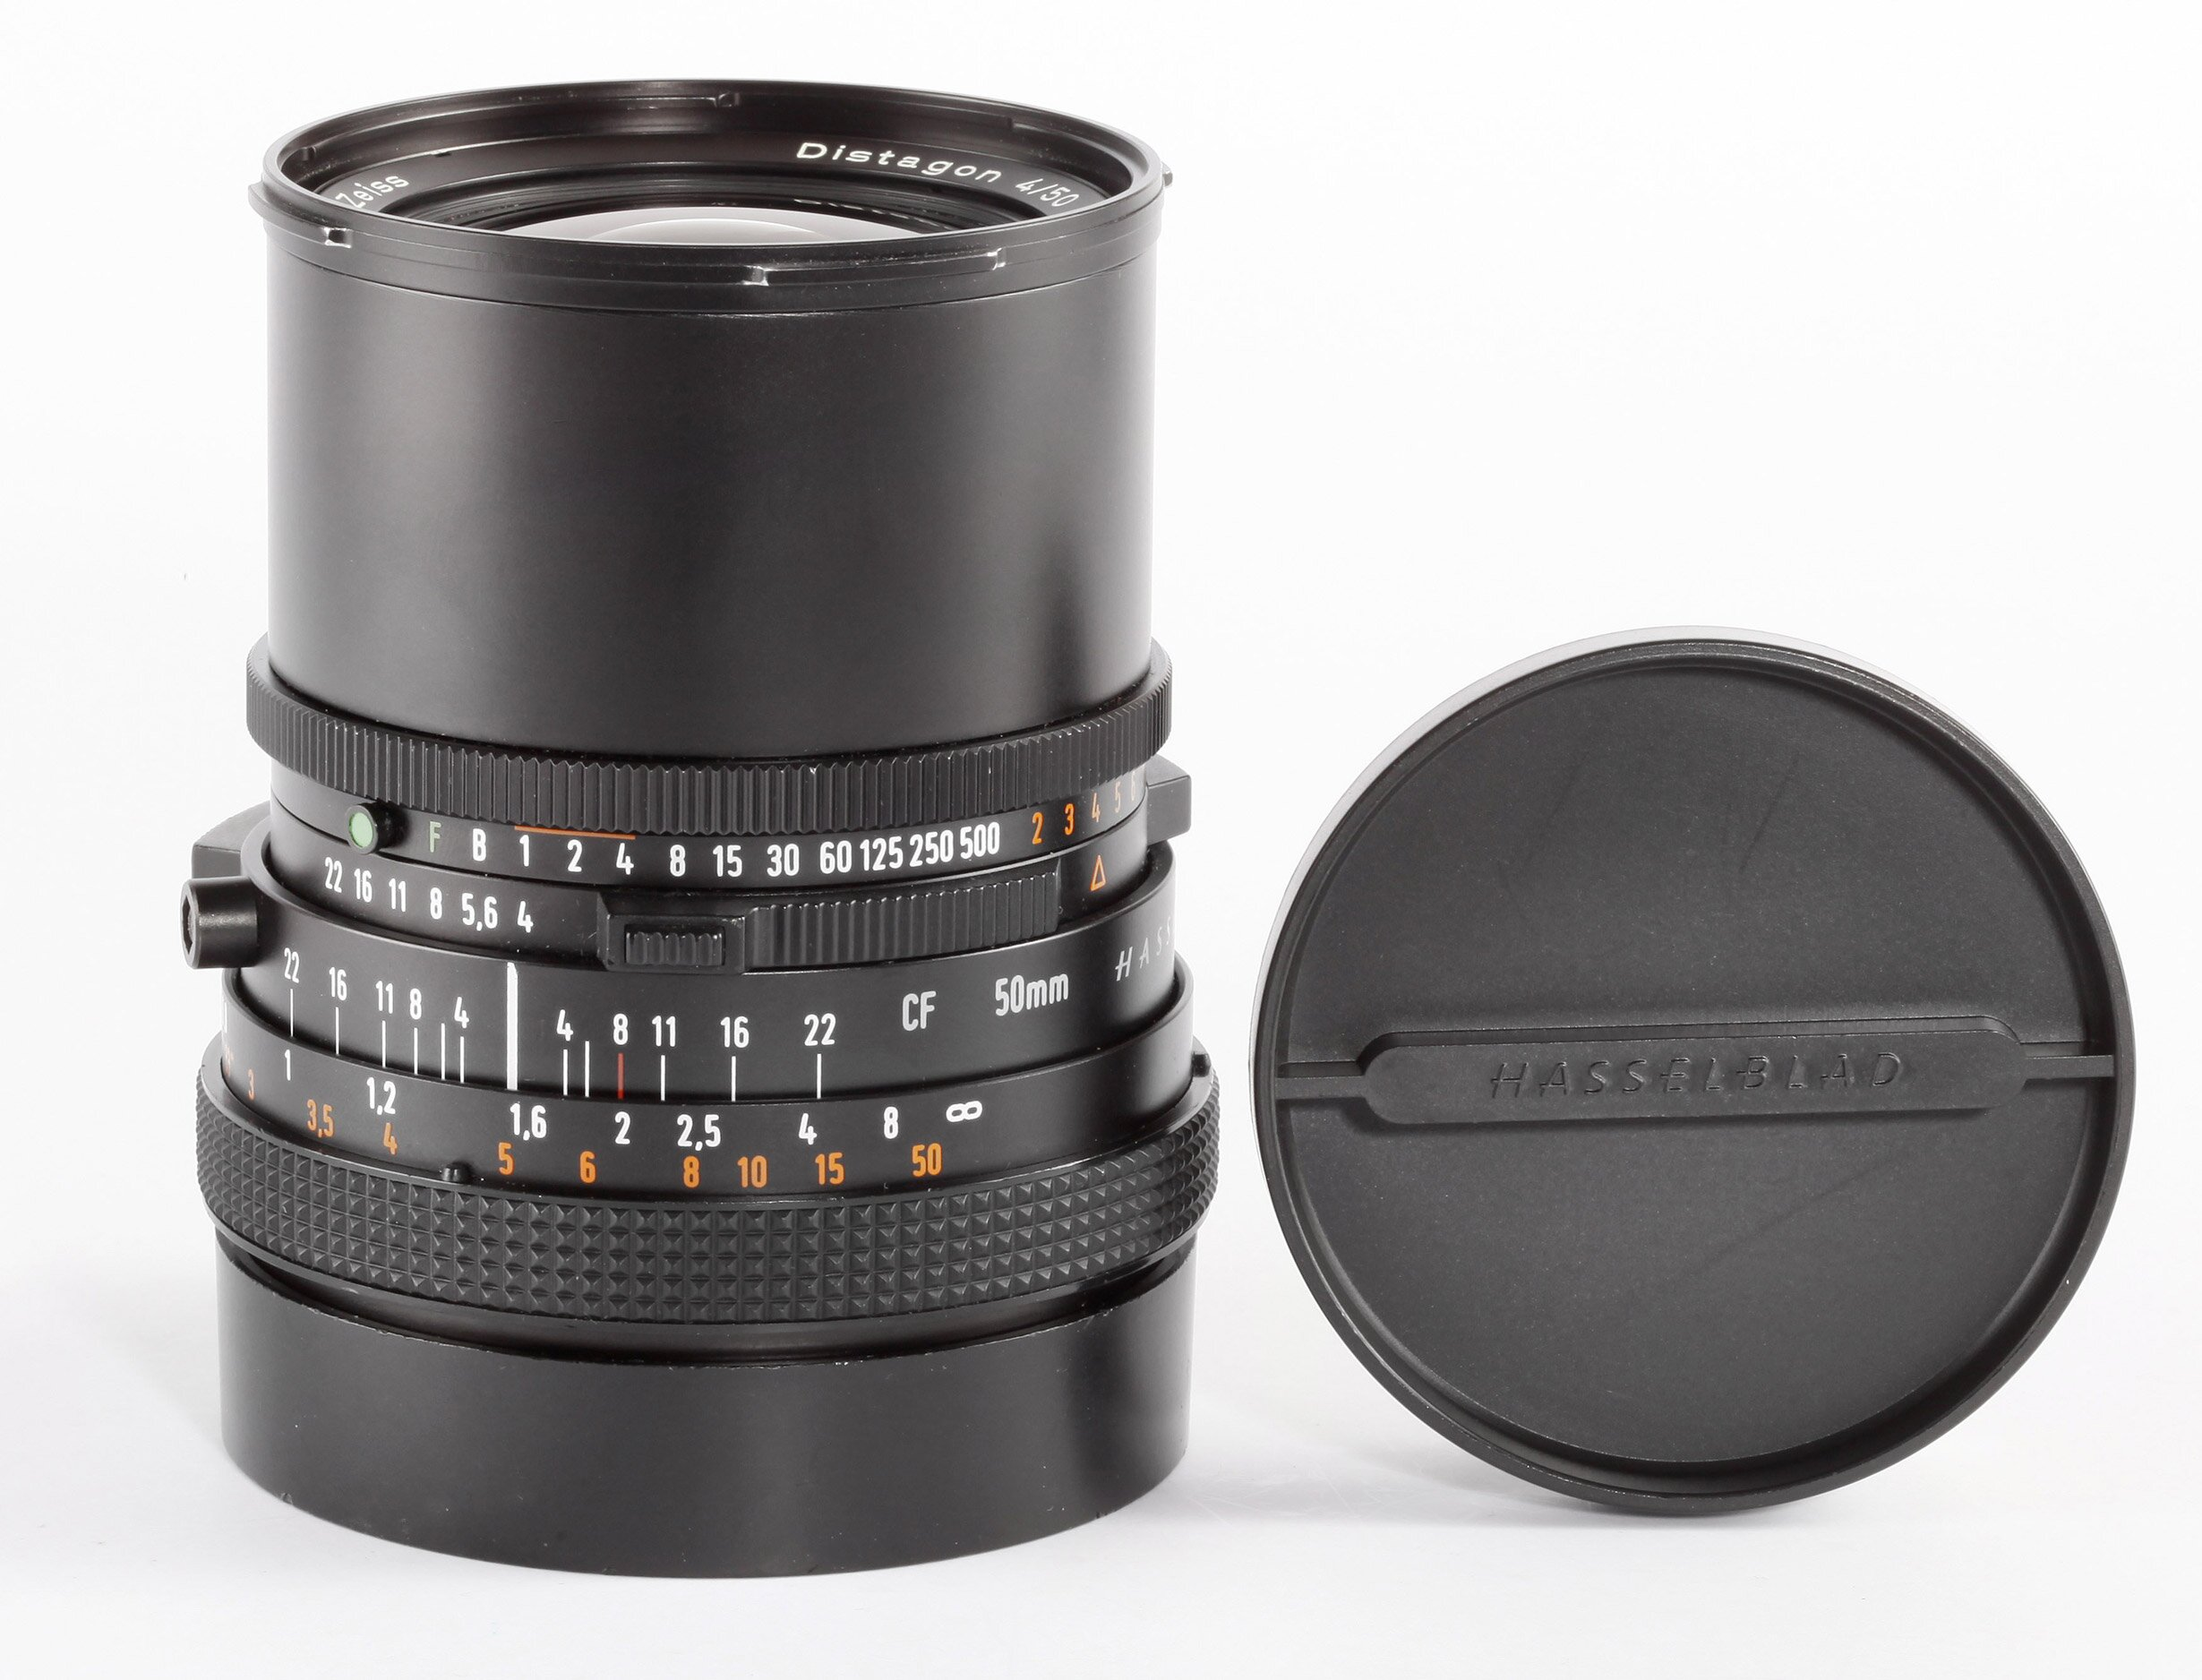 Hasselblad CF Distagon 4/50mm T*